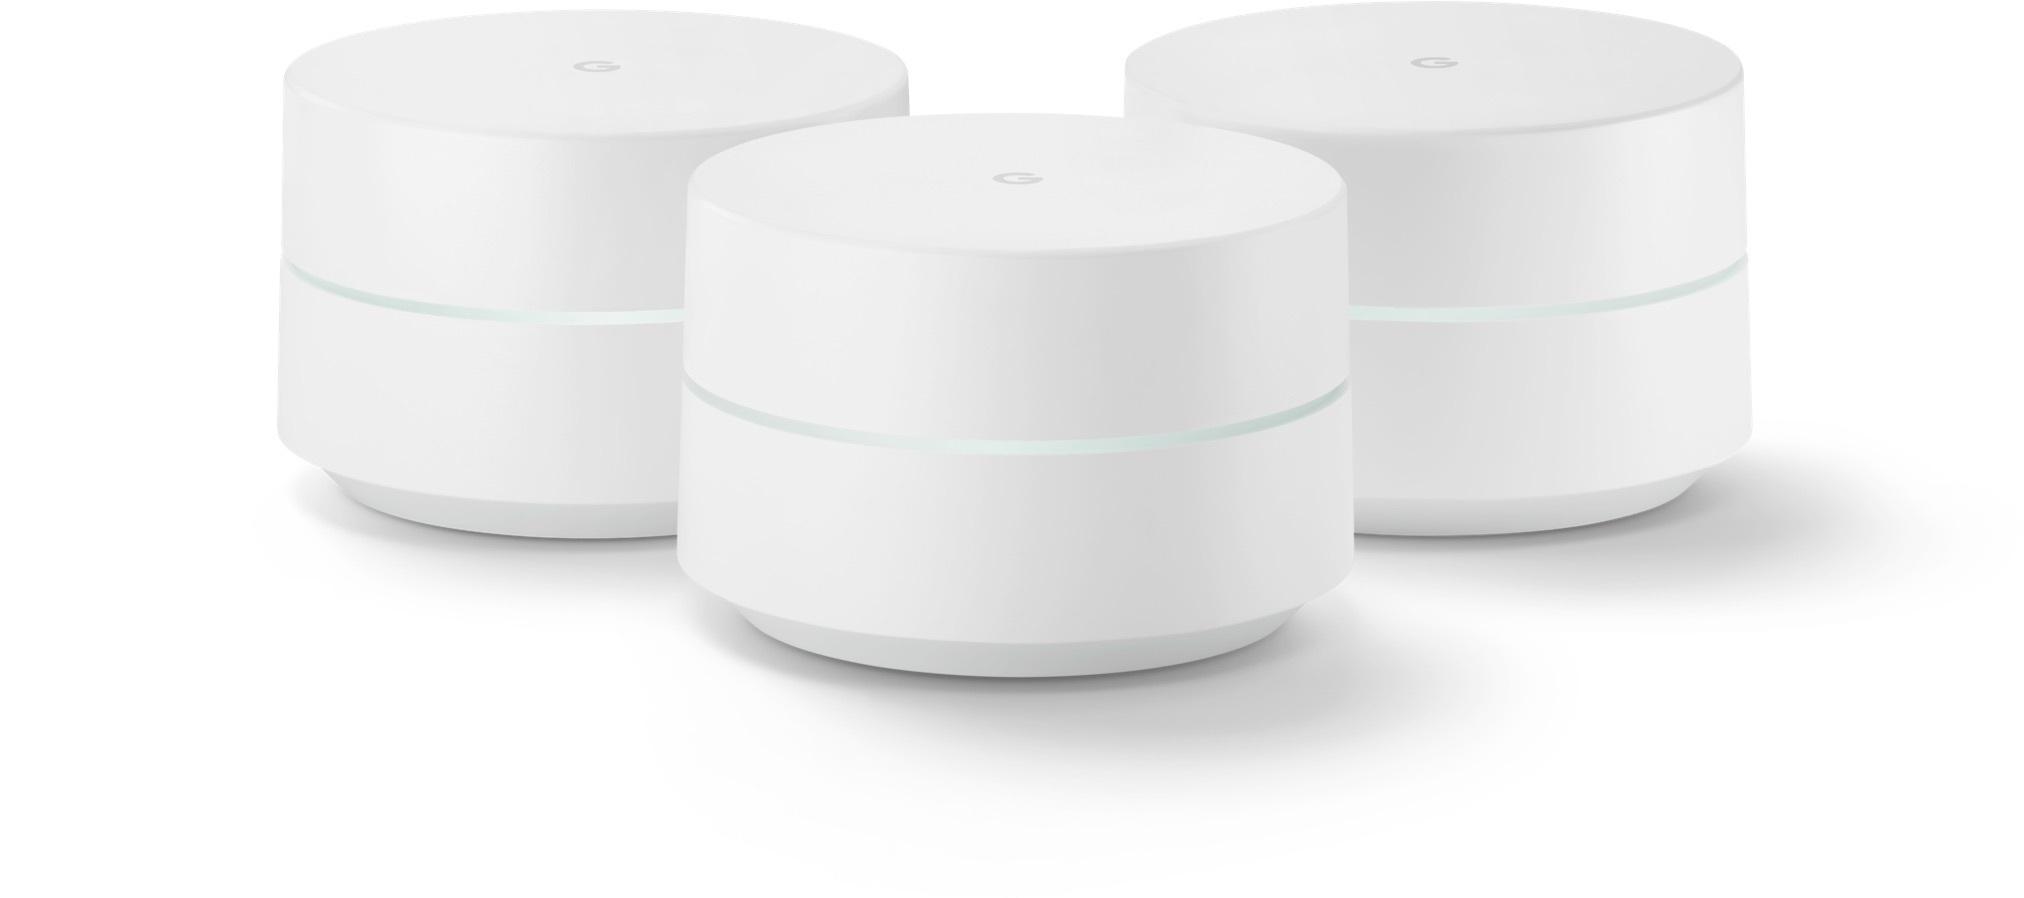 Google Wifi vs Netgear Orbi detailed comparison as of 2019